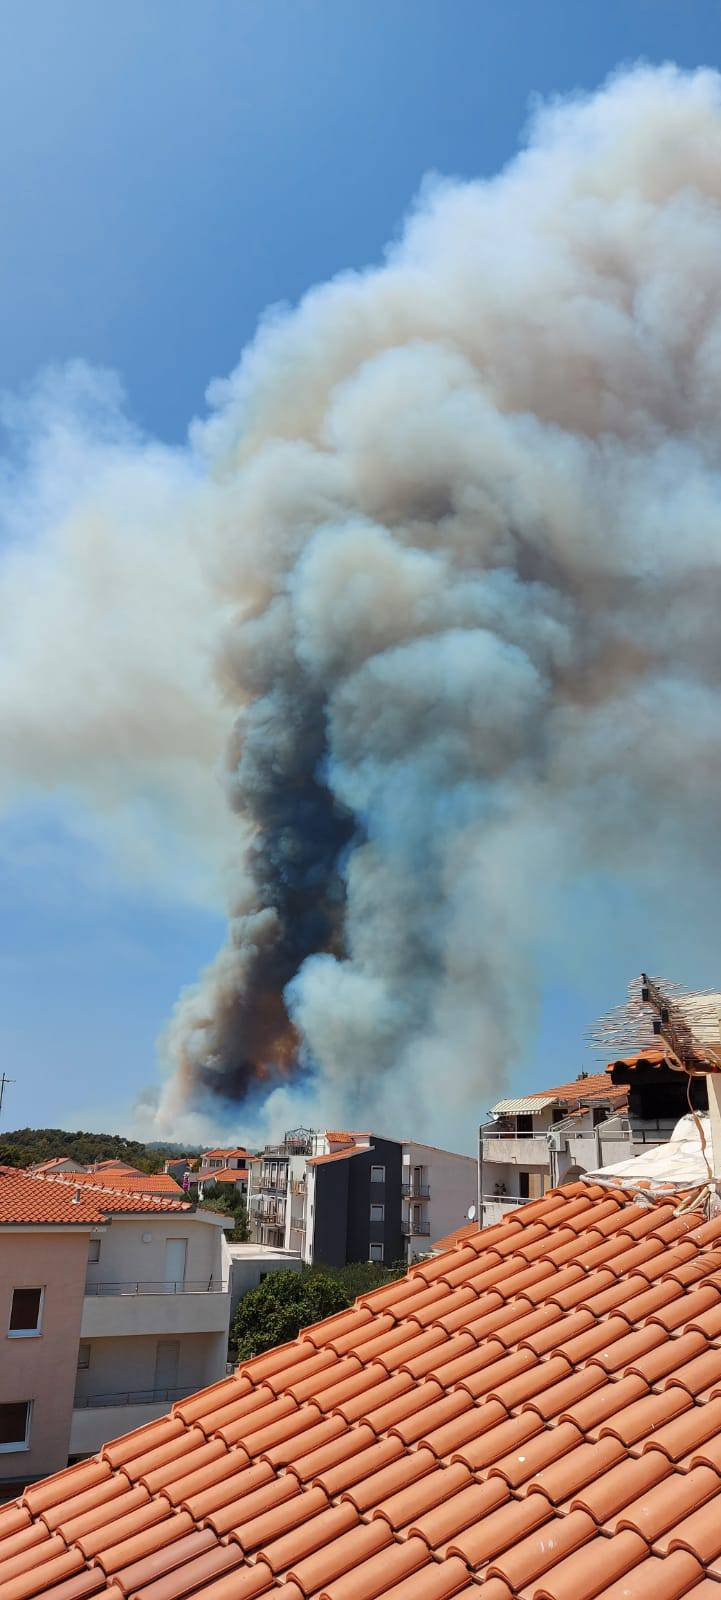 FOTOGALERIJA Na Čiovu izbio veliki požar, blizu je kuća, gusti dim gutao sve pred sobom